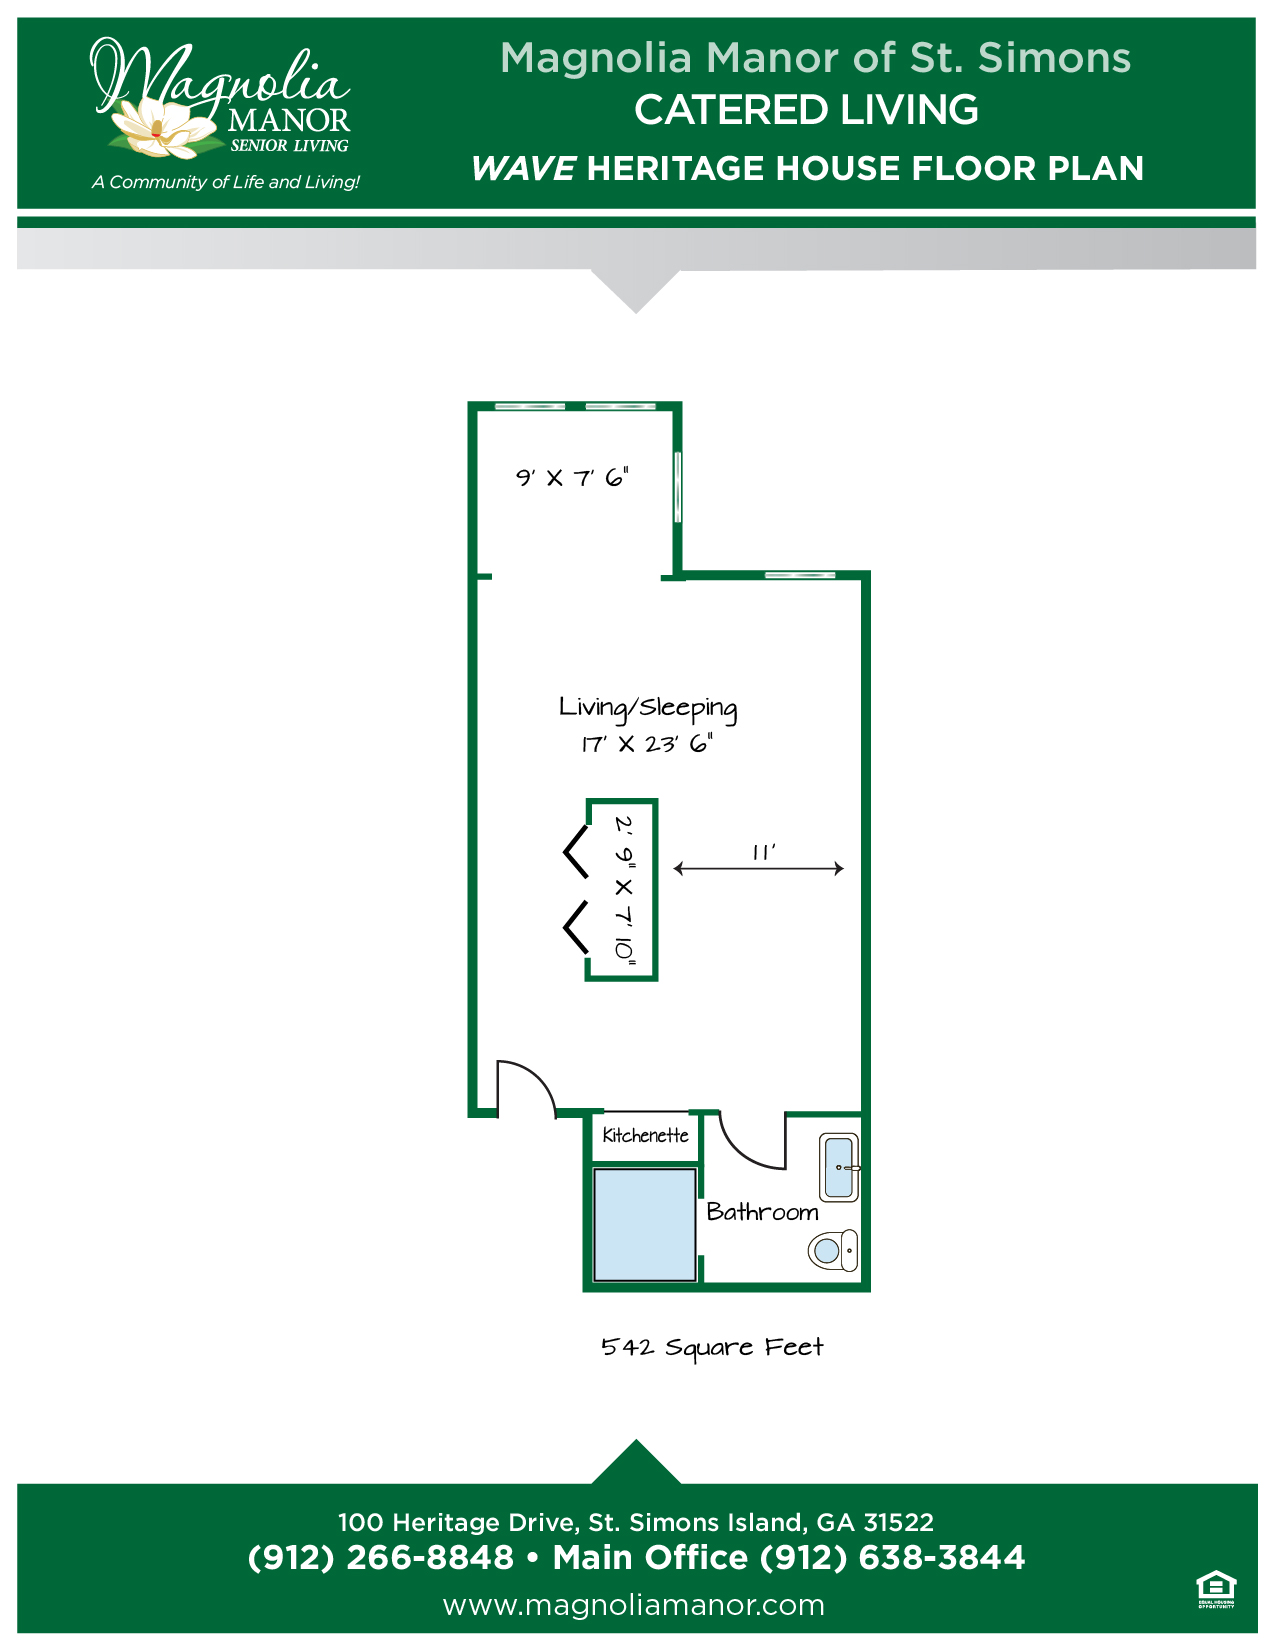 00344 St Simons CC WAVE Heritage House Floor Plans 2019-01